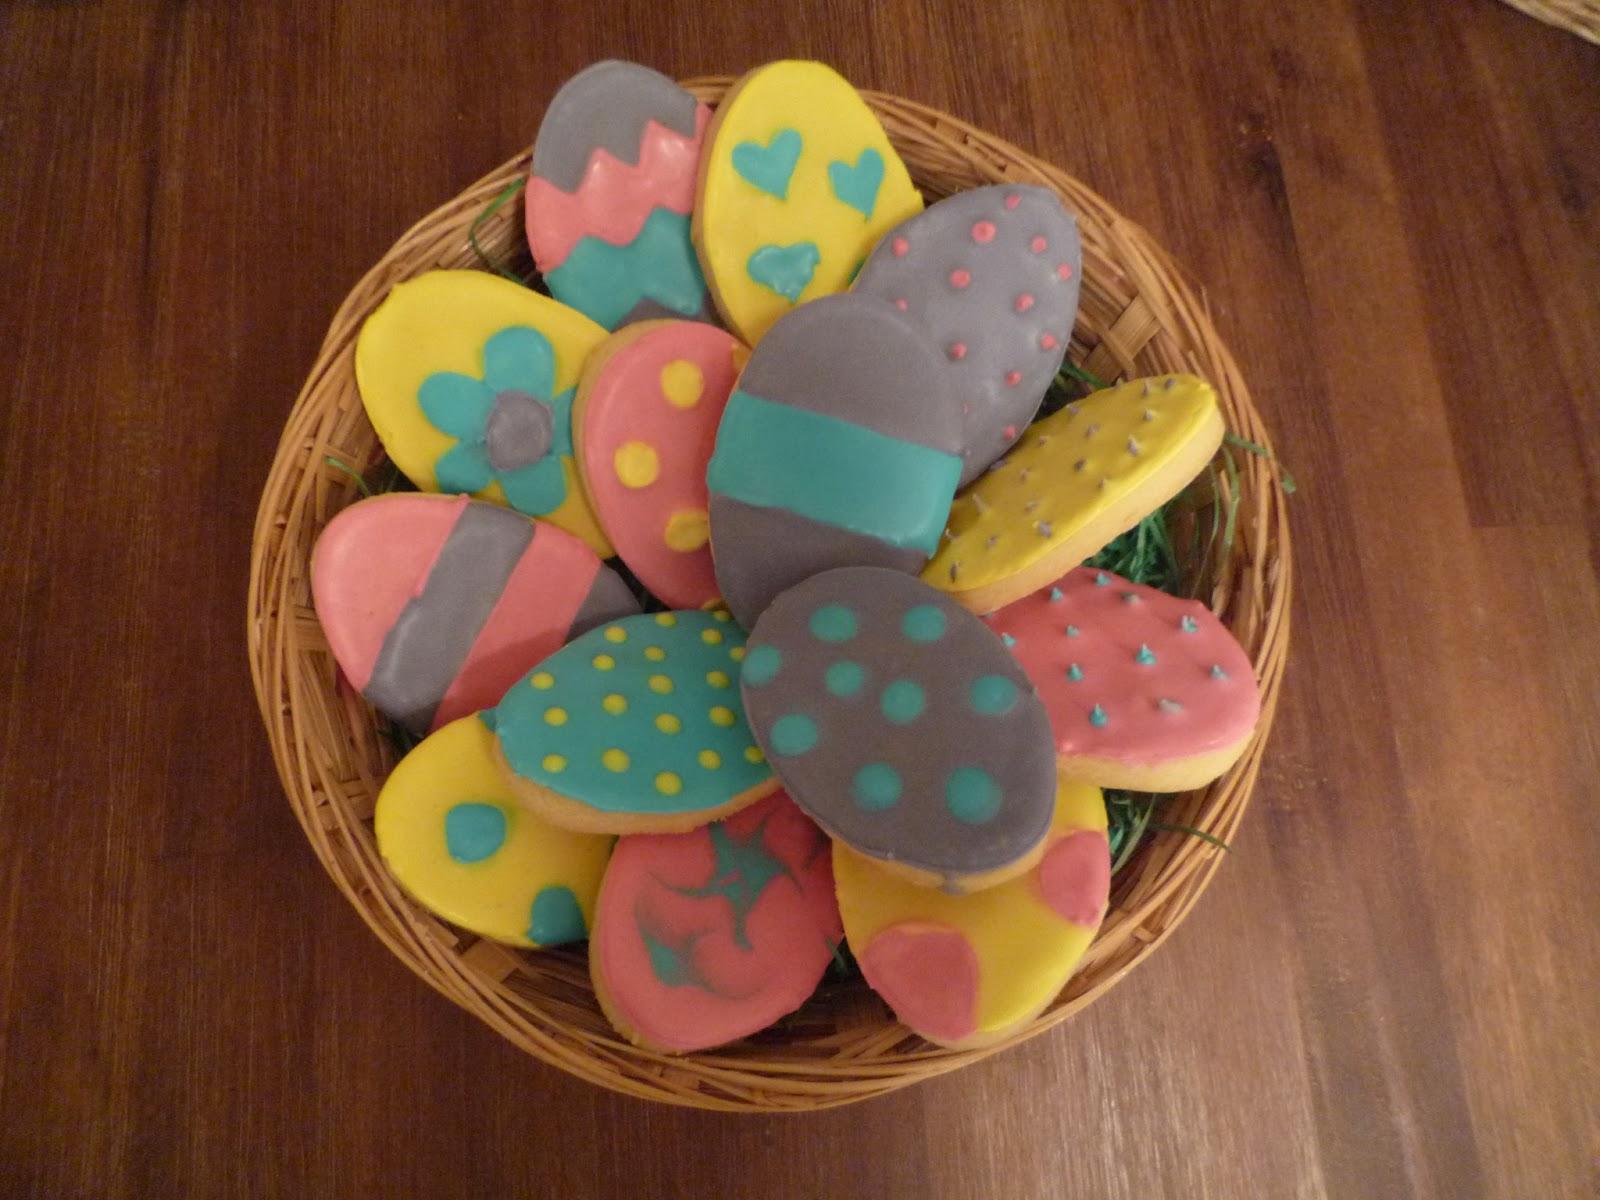 Osterei-Kekse, Ostereikekse, Kekse, Osterkekse, Oster-Kekse, Royal Icing